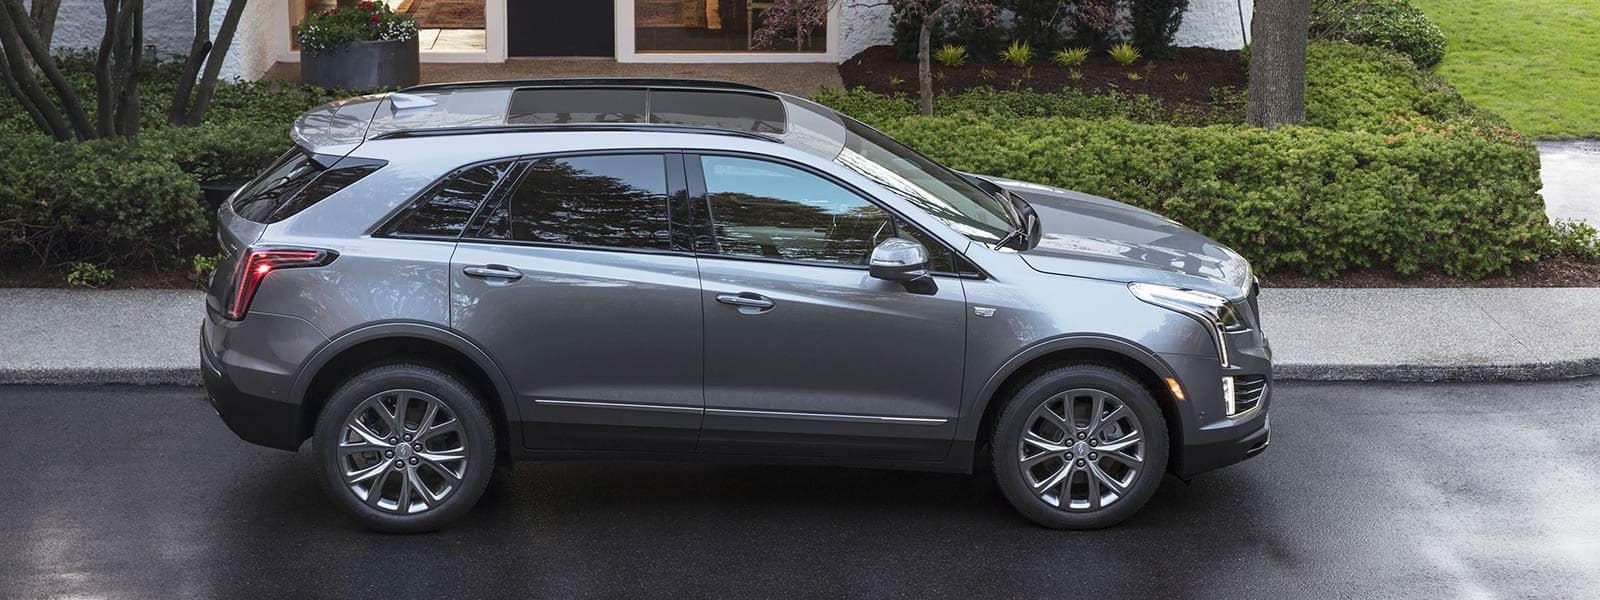 Buy new 2021 Cadillac XT5 in Weyburn Saskatchewan